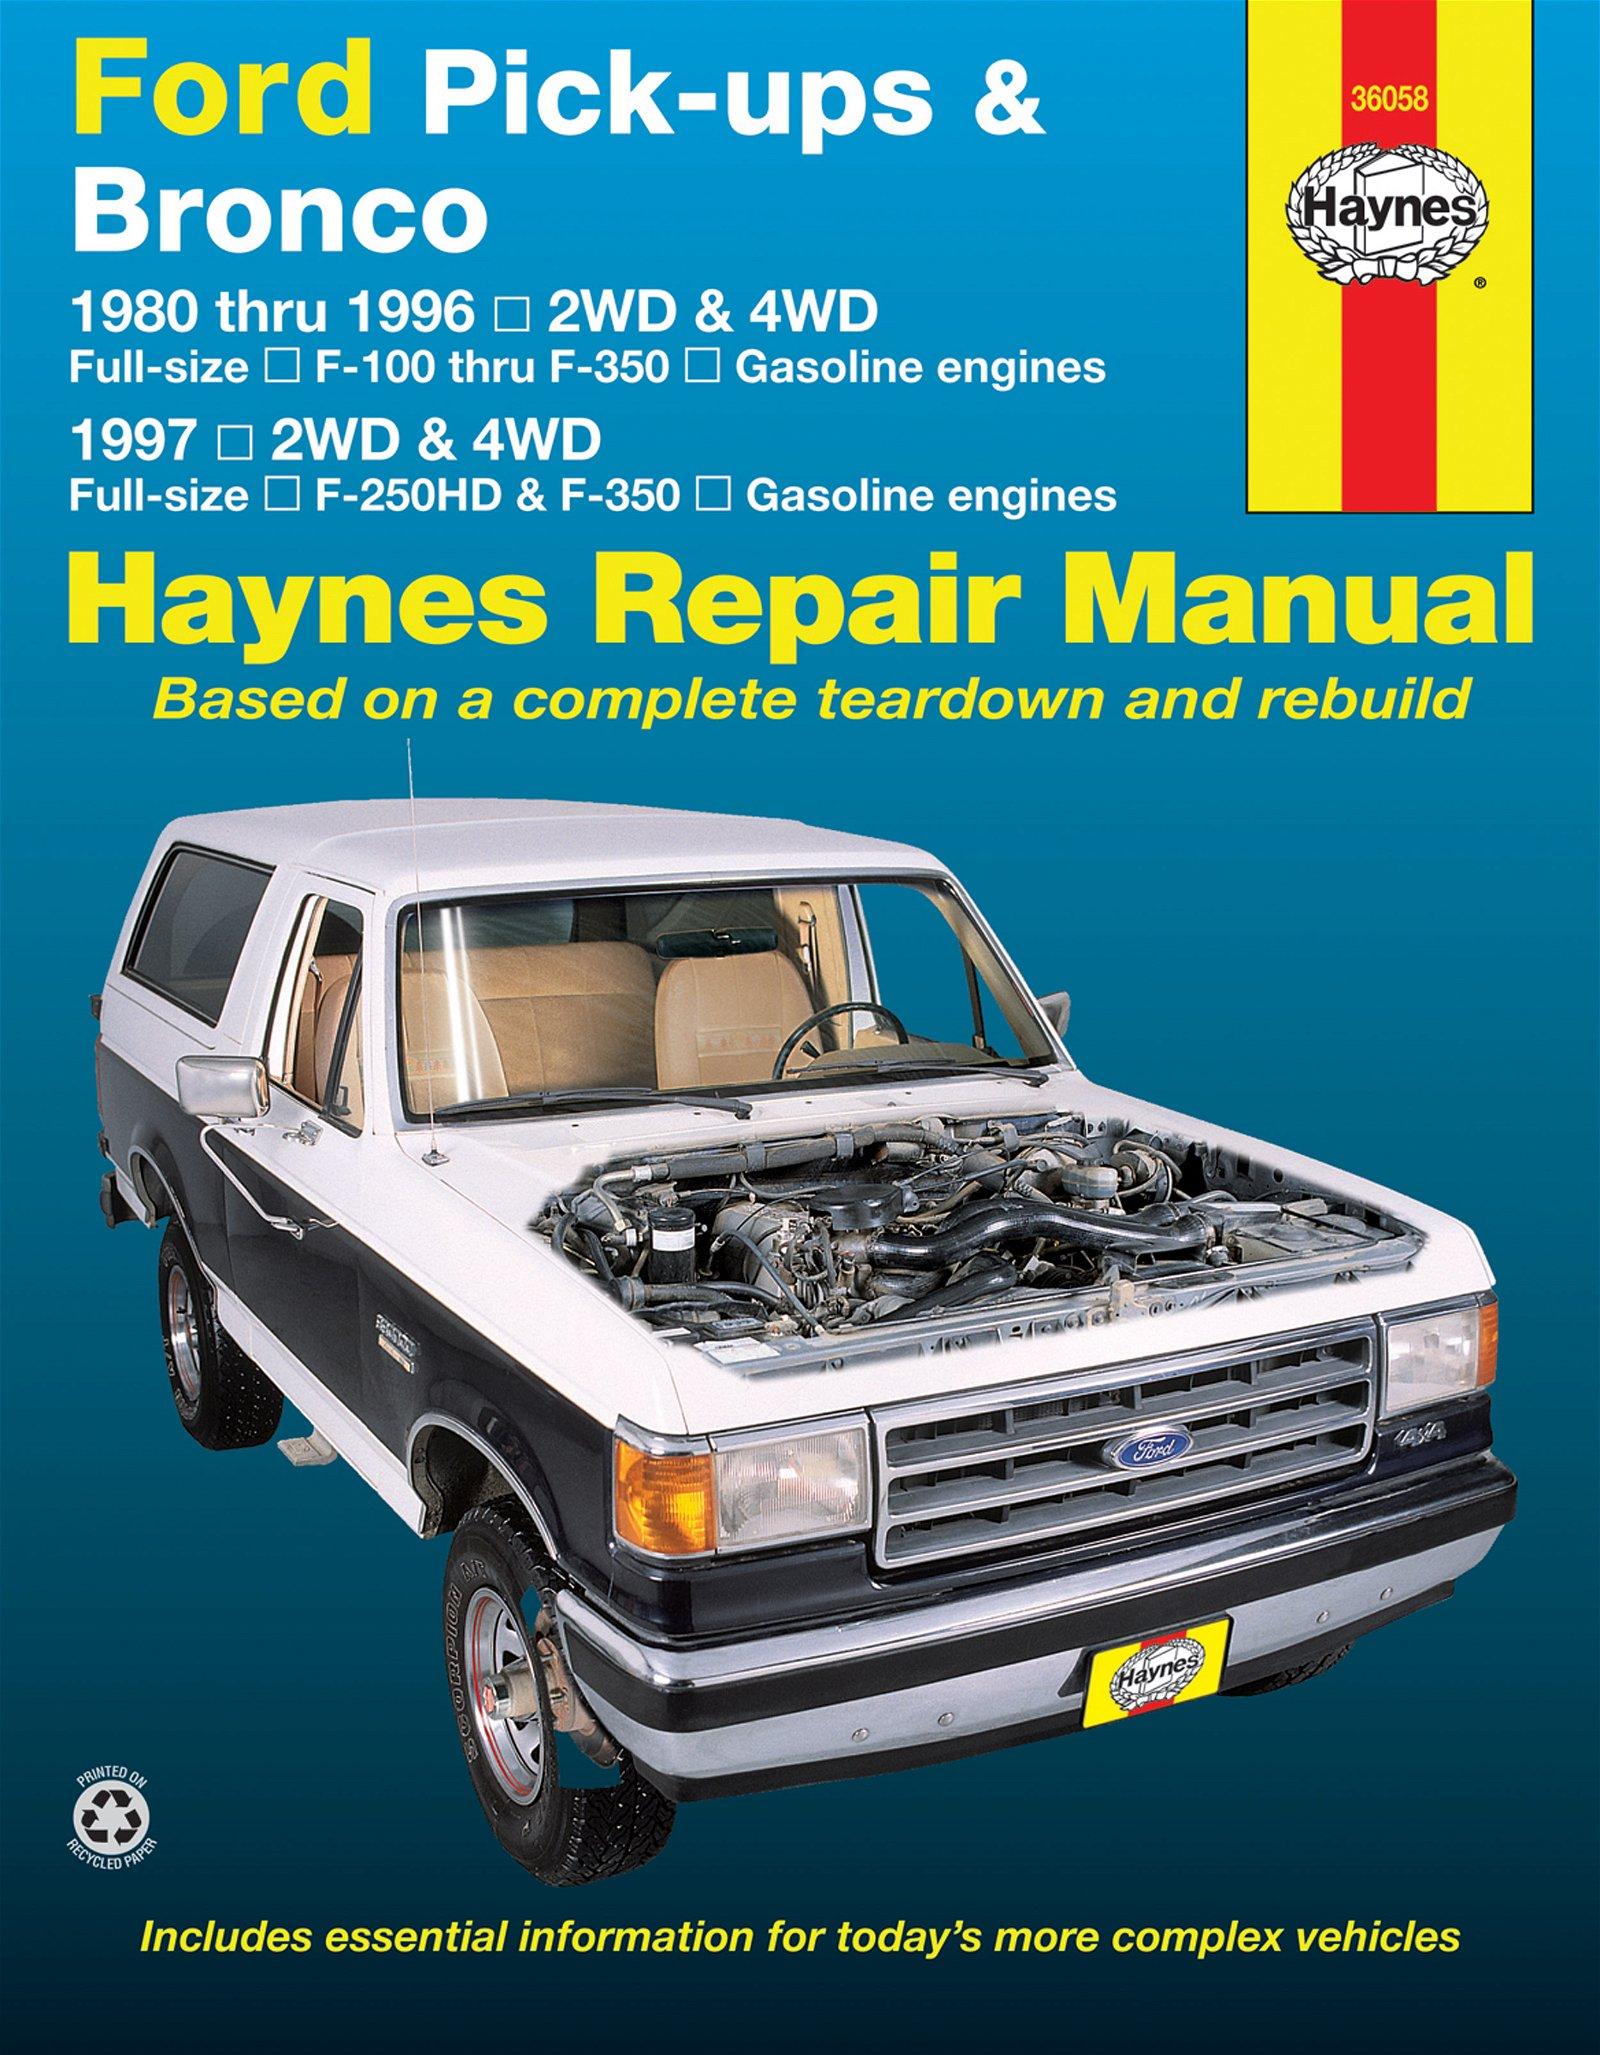 [Manuel US en Anglais] Ford Pick-ups & Bronco  '80 -  '96